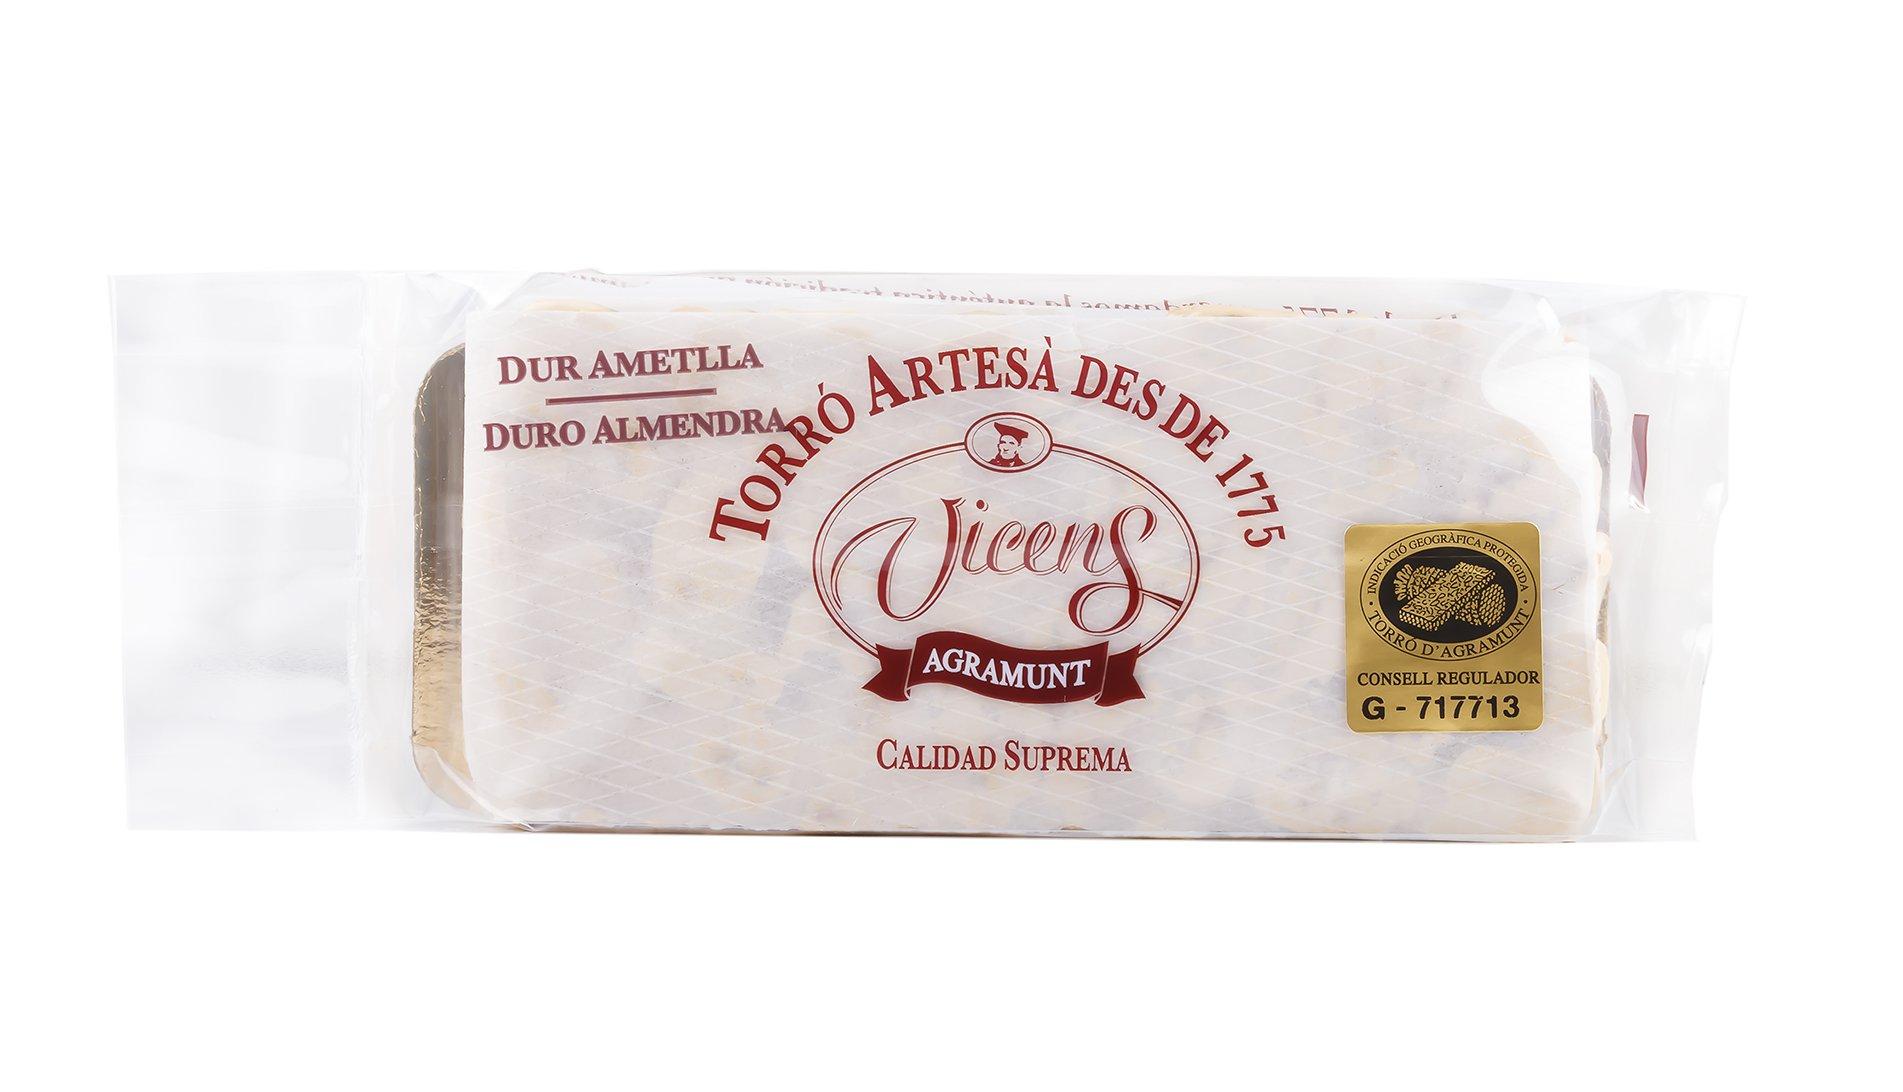 Buy Vicens Hard Almond Turron online